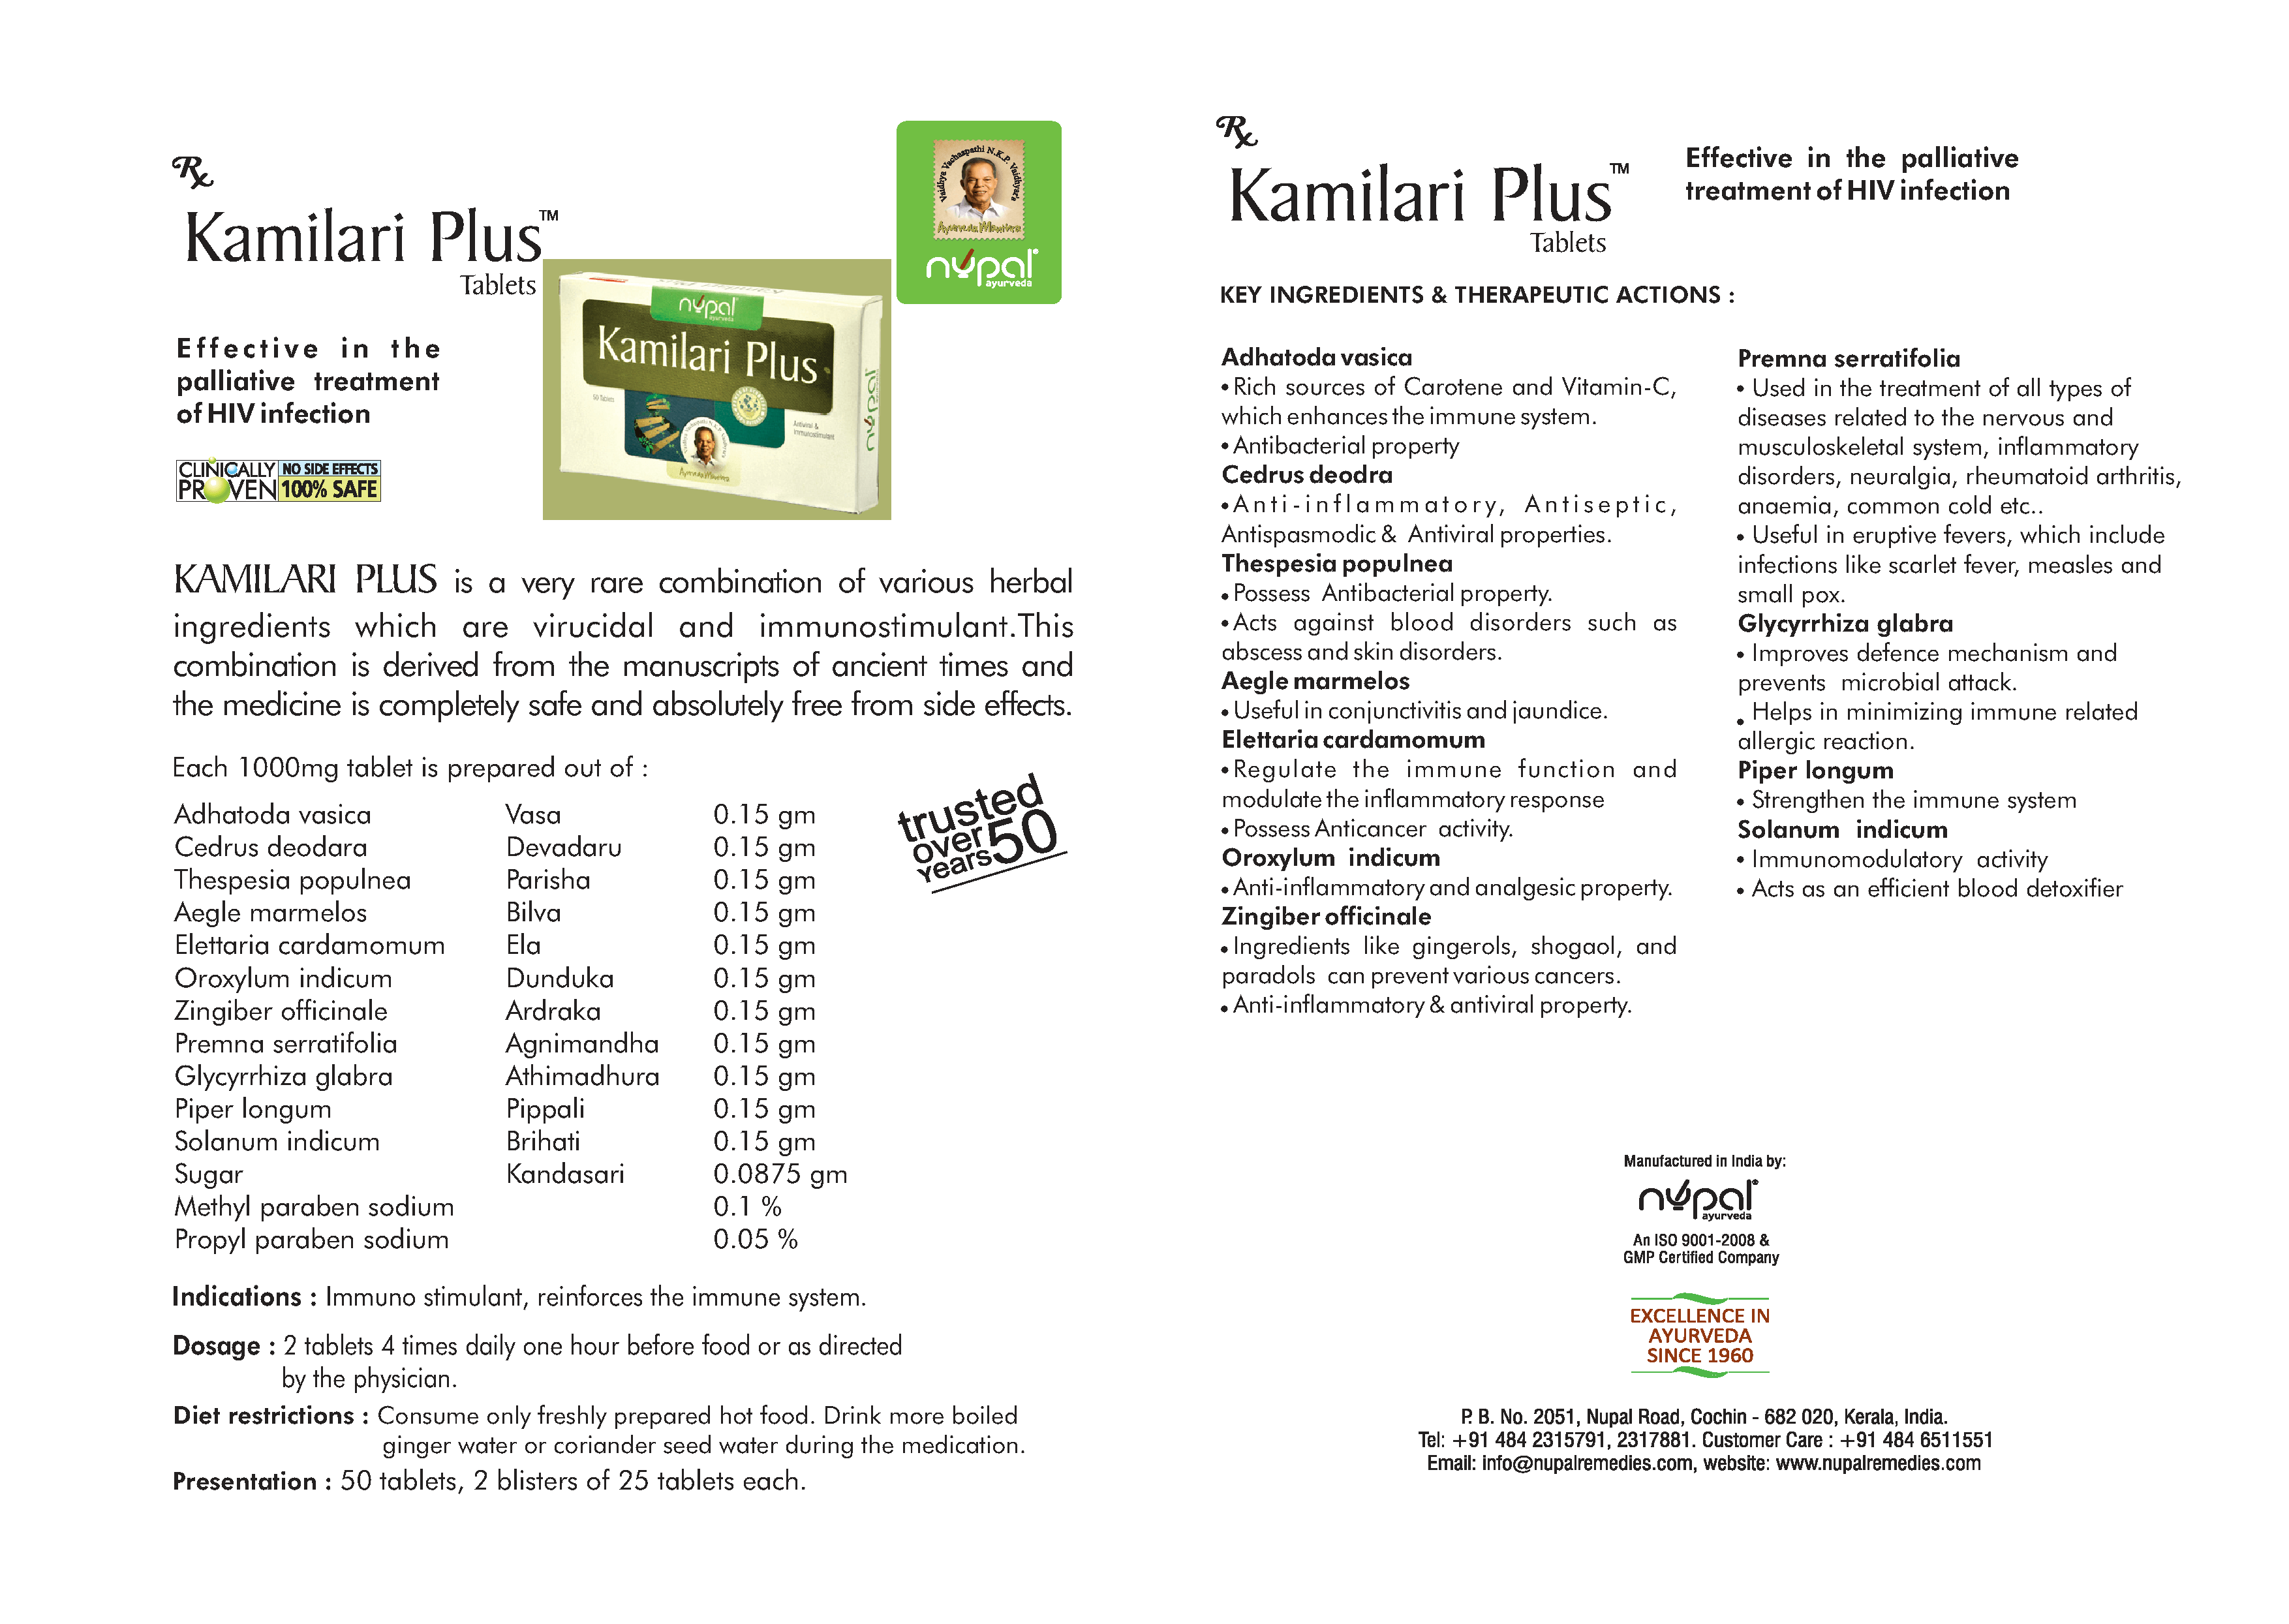 Камилари Плюс (Kamilari Plus, Nupal Remedies) | Роса-Фарм